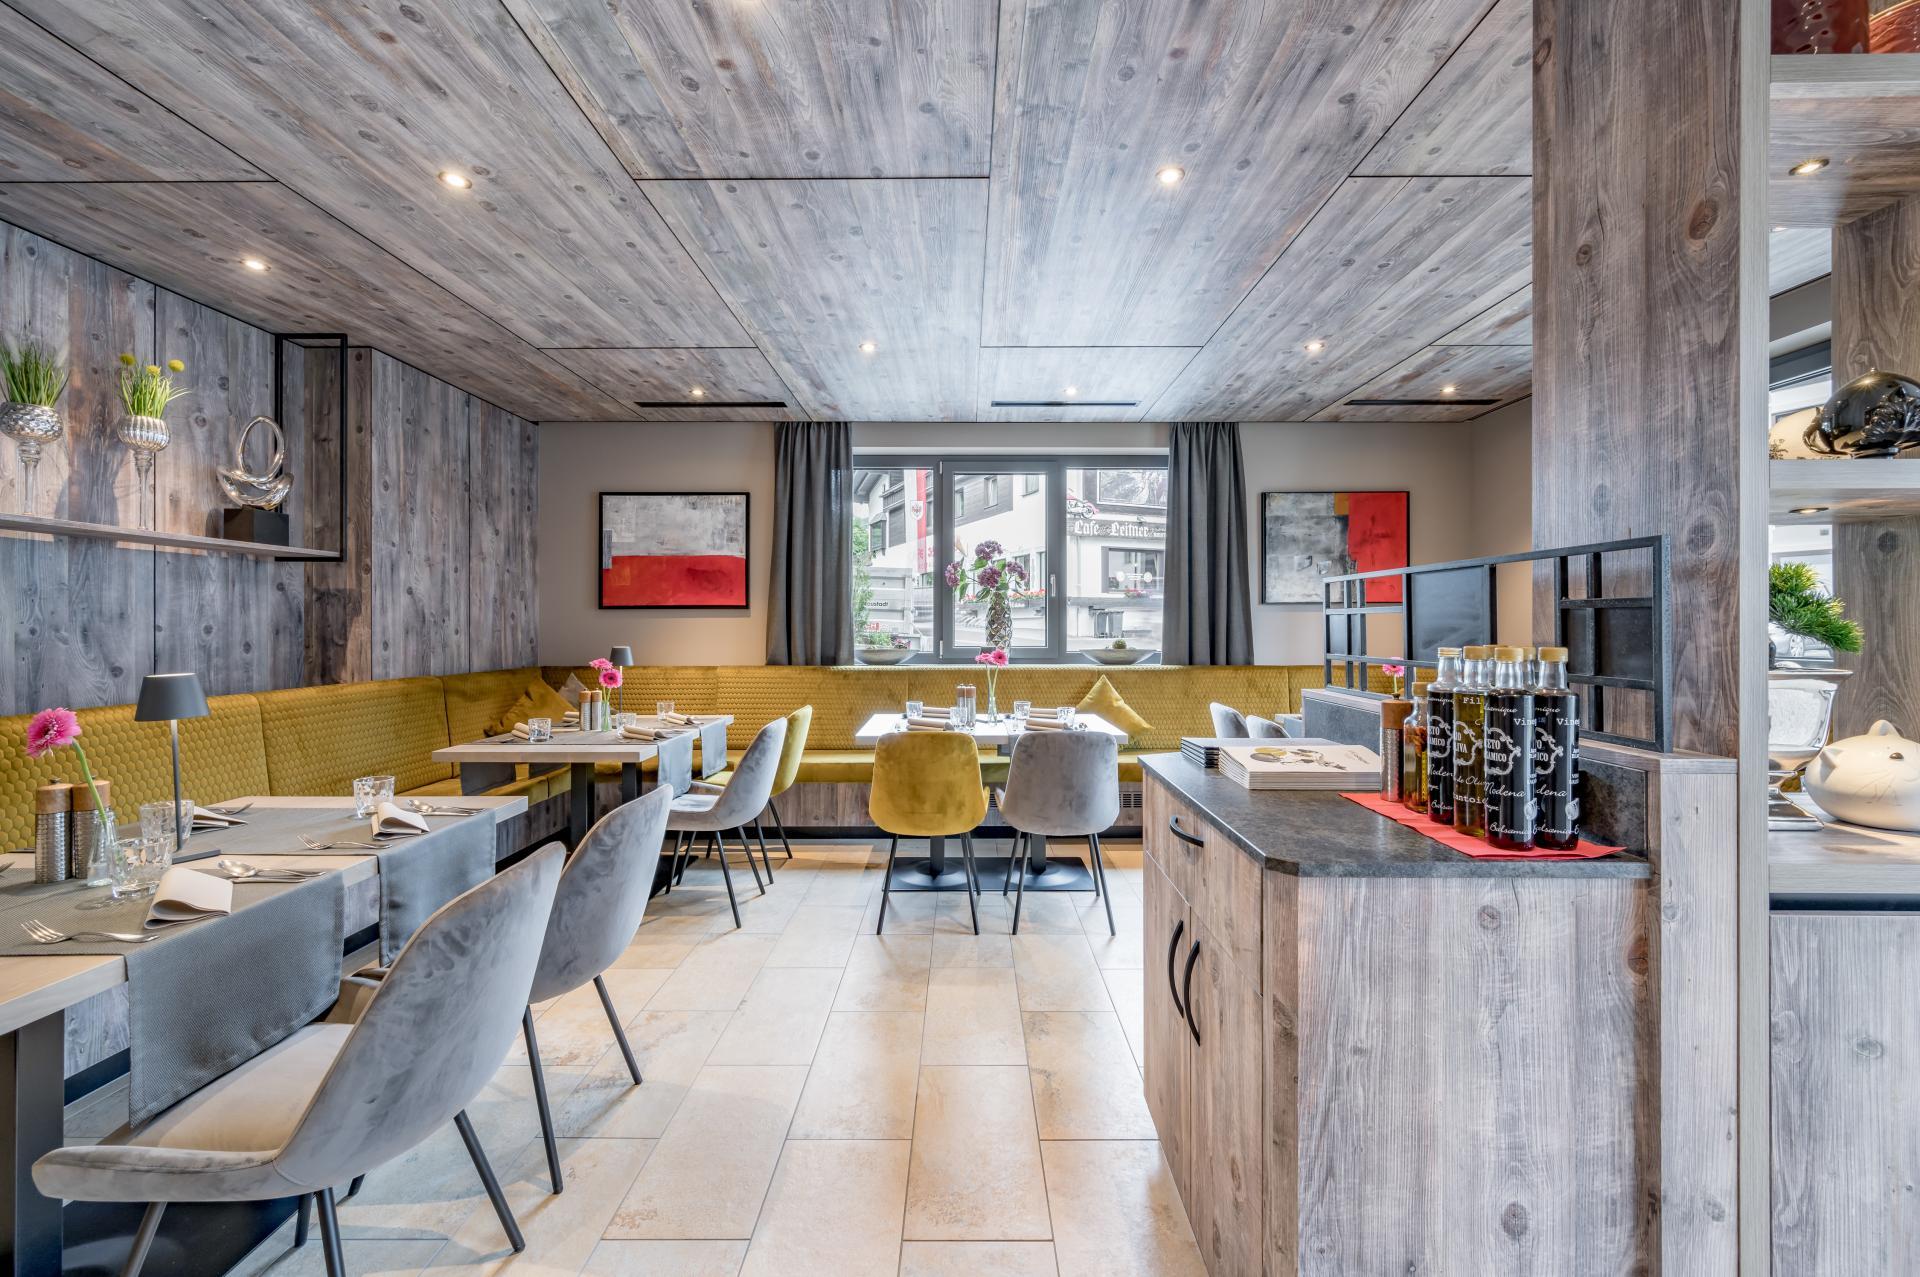 Restaurant-Appartements #Restaurant#Bildergalerie